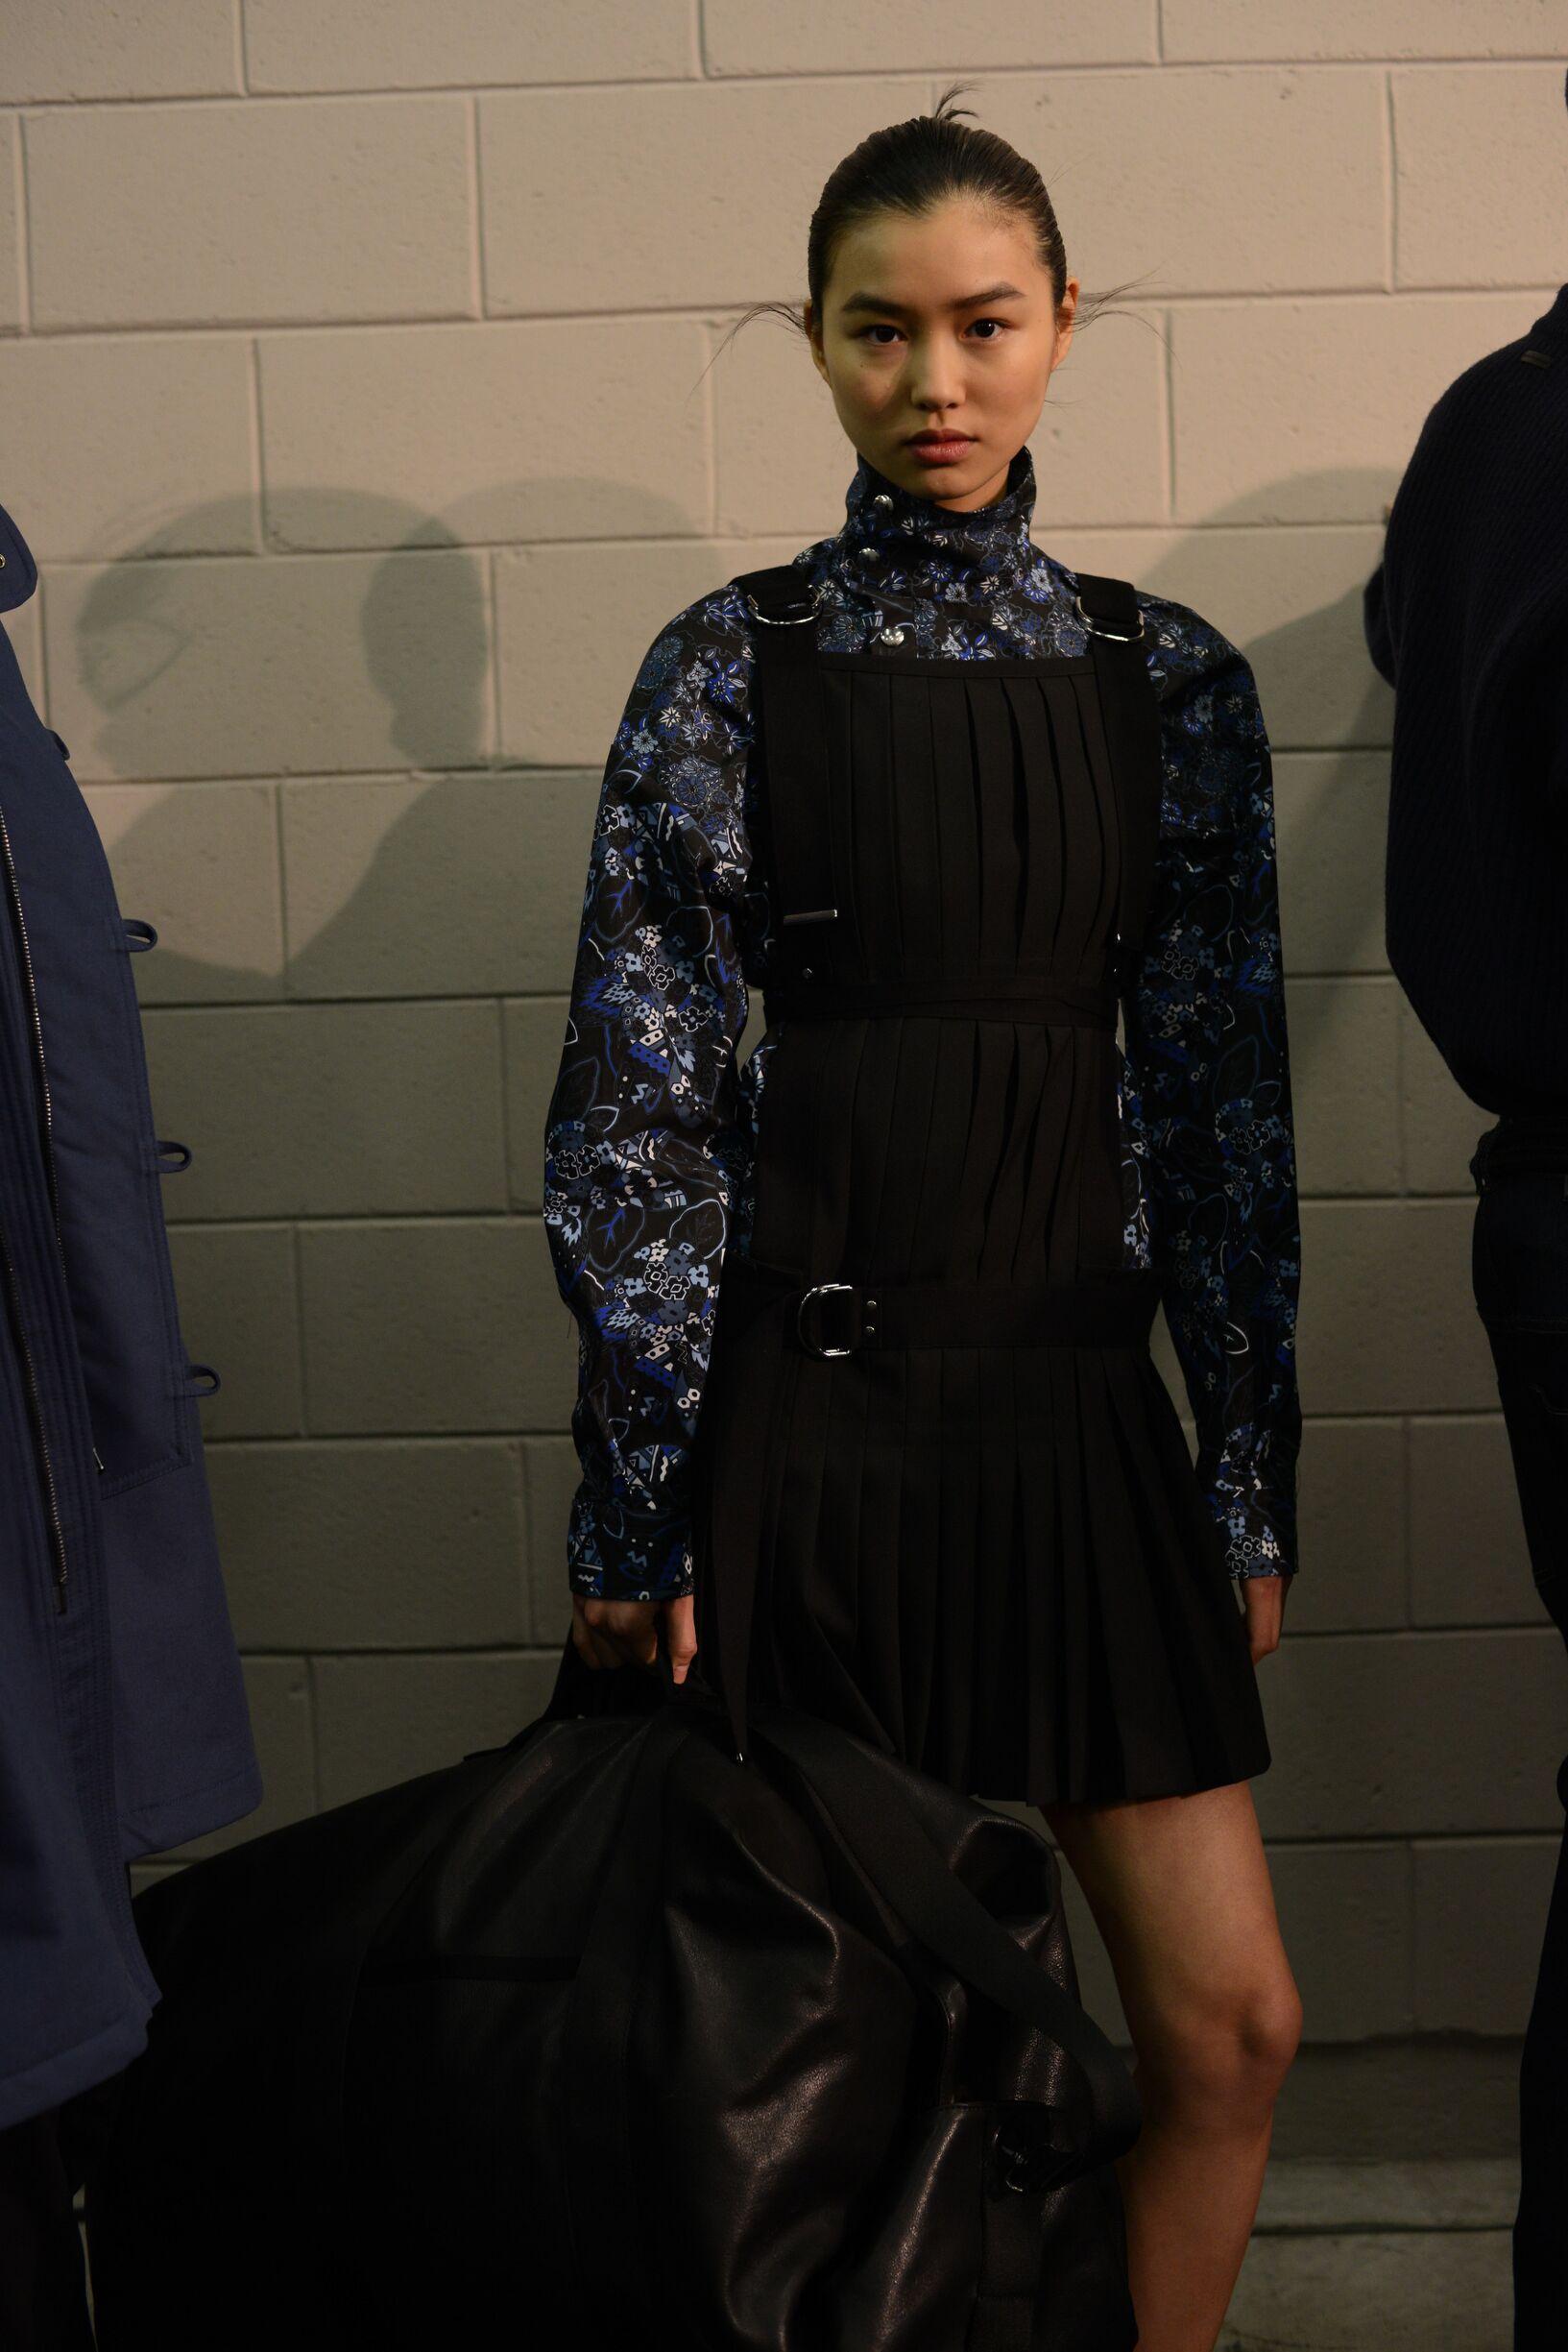 Backstage Woman Diesel Black Gold Model